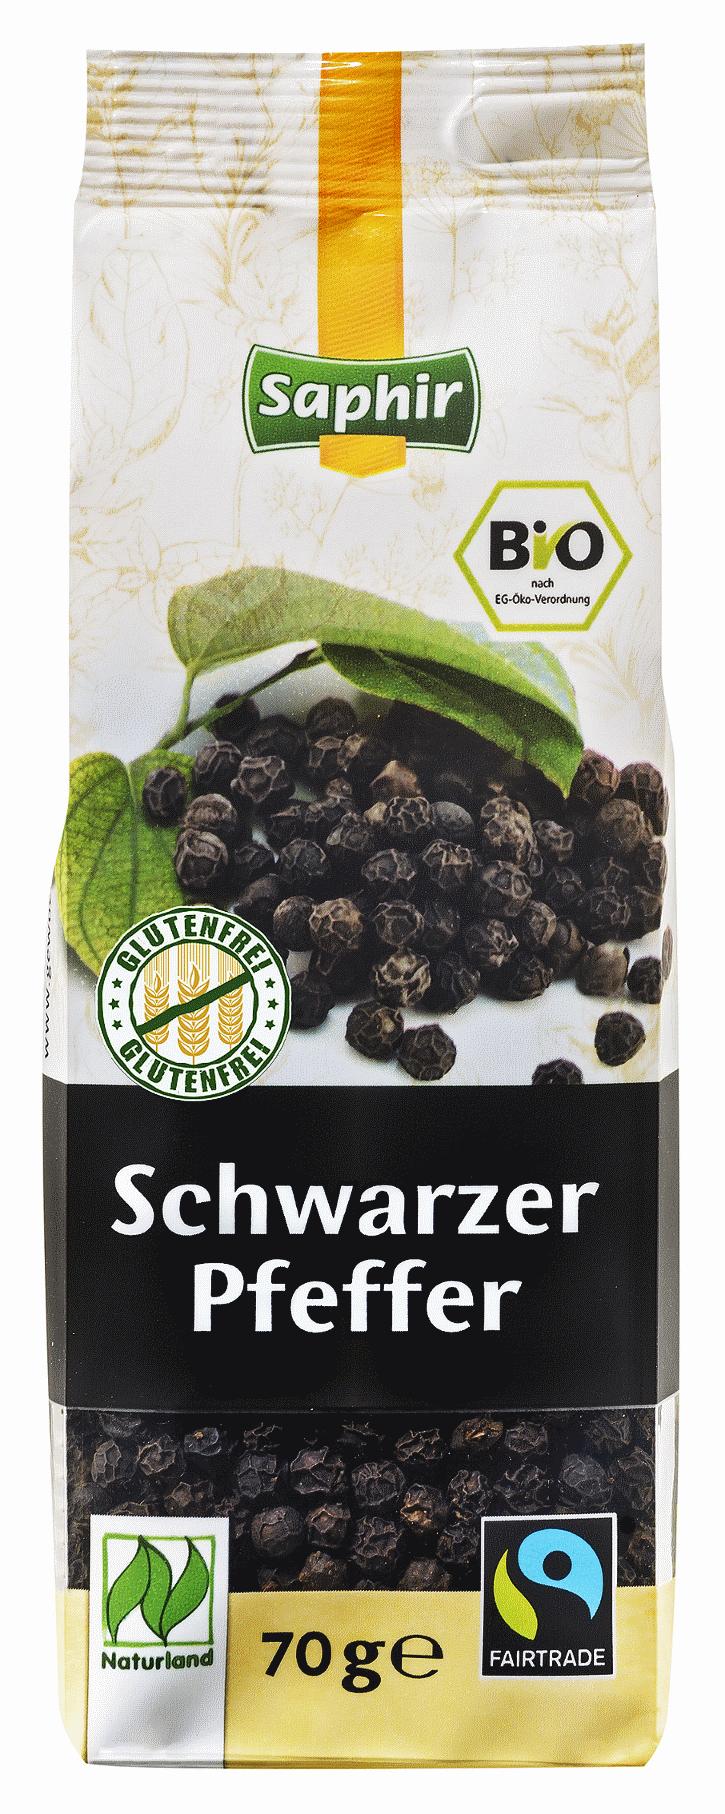 Schwarzer Pfeffer